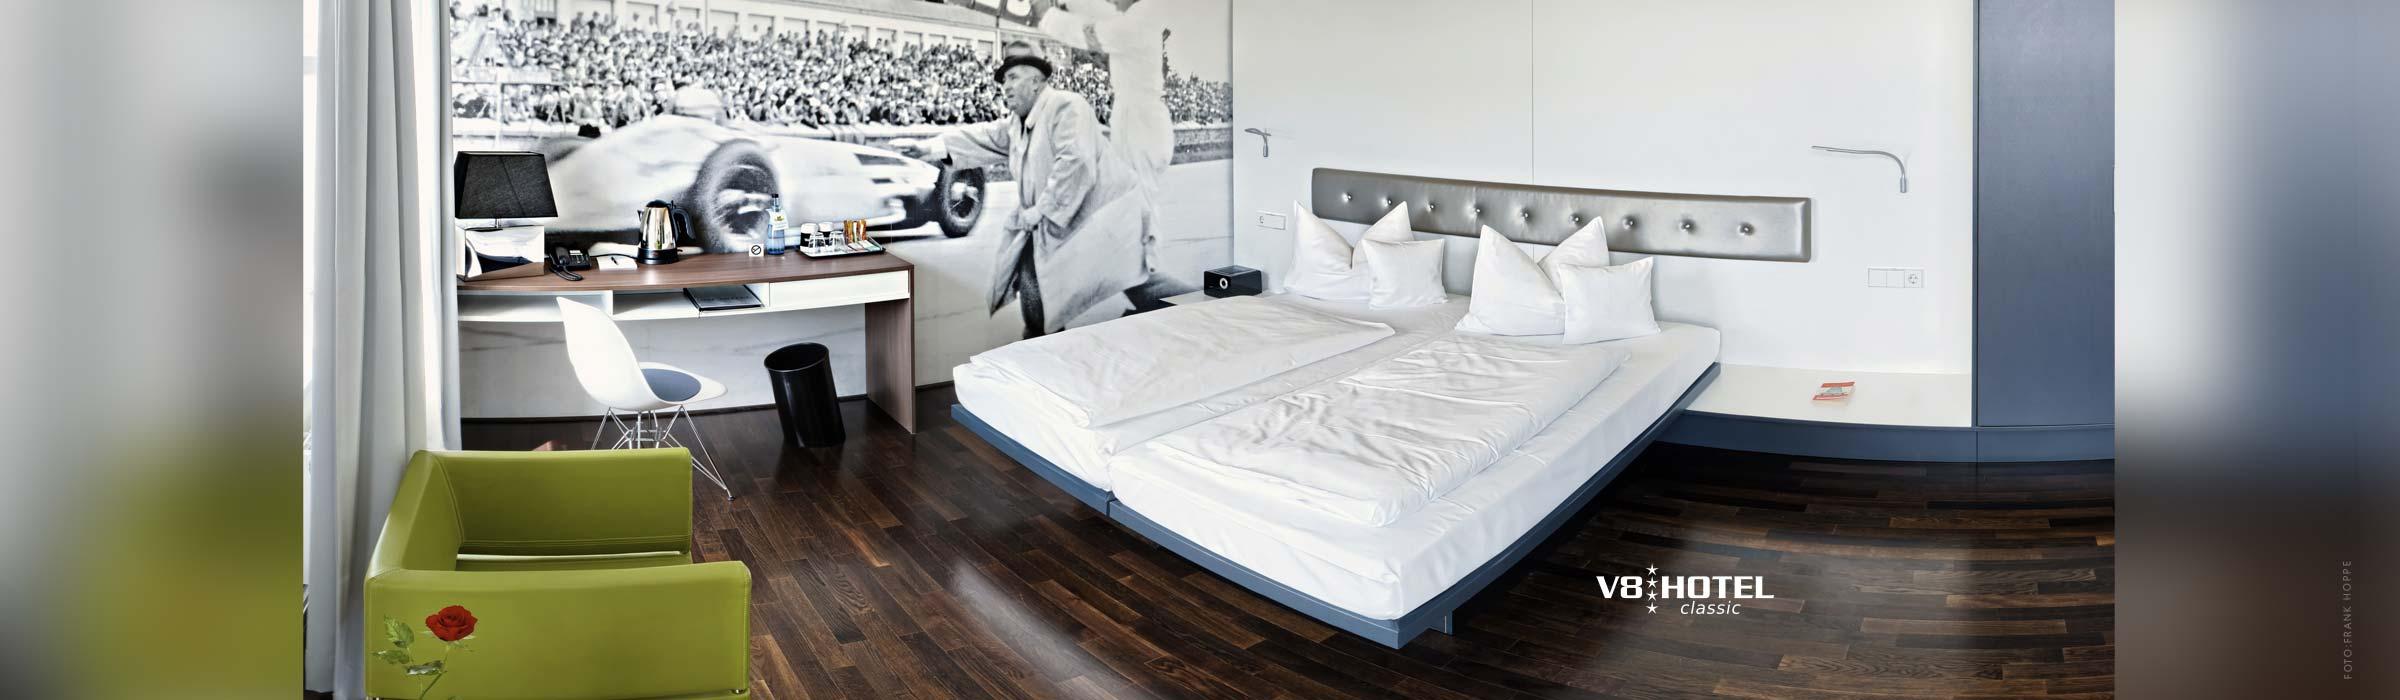 V8 Hotel | Themen- und Designhotel Motorworld Stuttgart